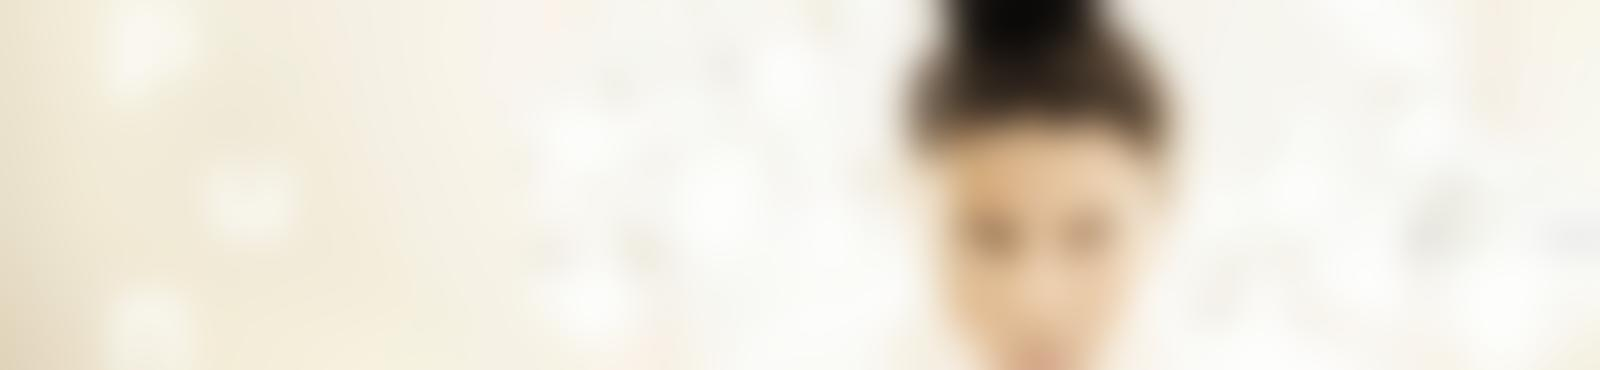 Blurred b0430681 c698 4037 a871 ff48c38f3804